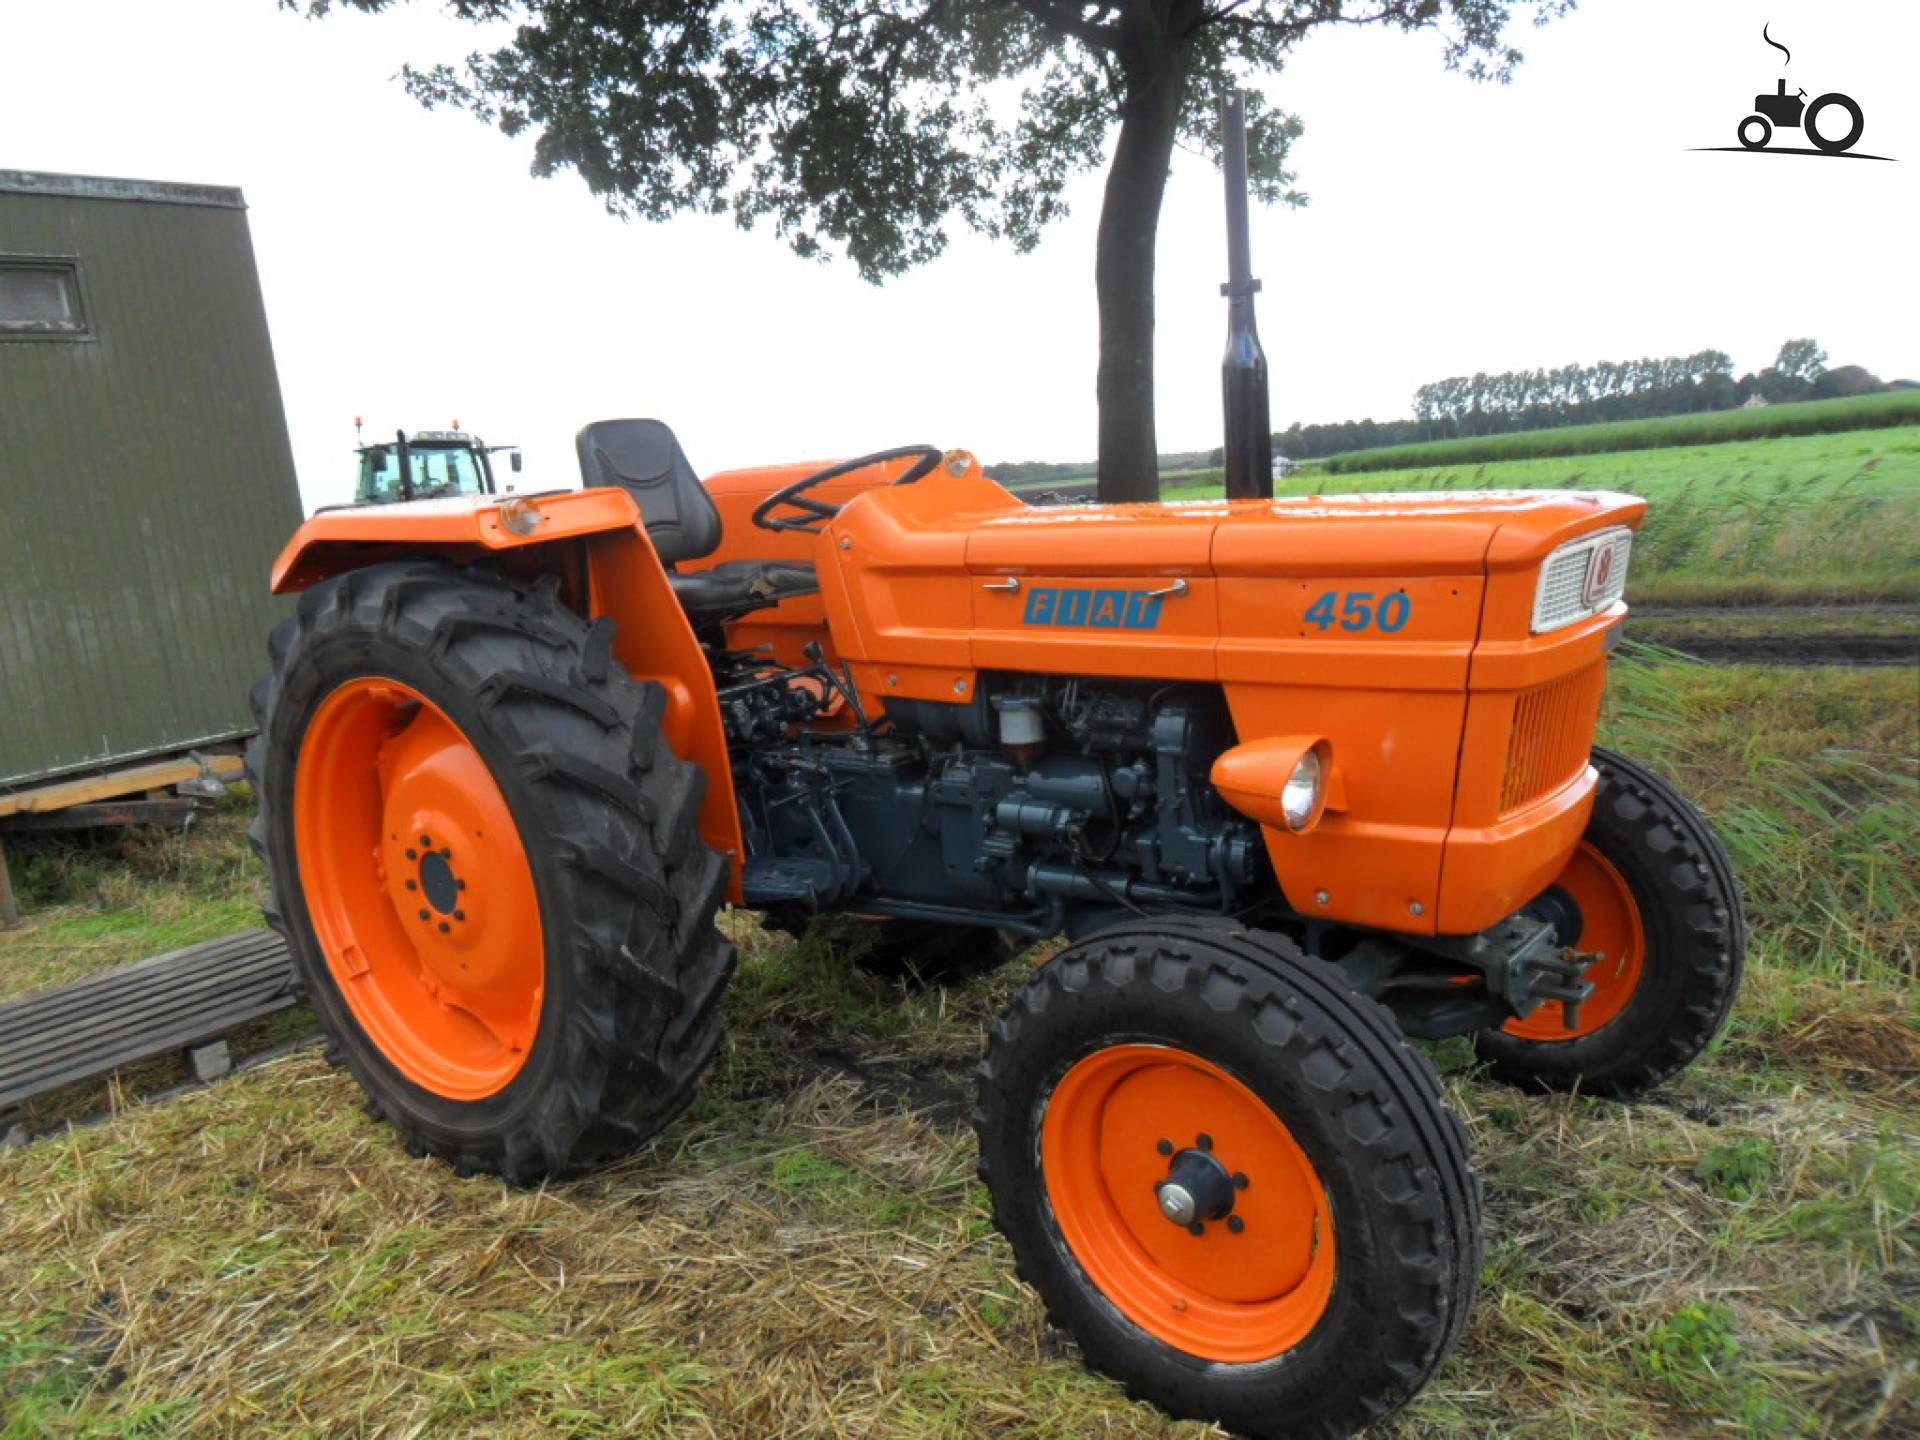 Trattore Agricolo Fiat 450 Dt Trattore Agricolo Fiat 420 Dt Trattore